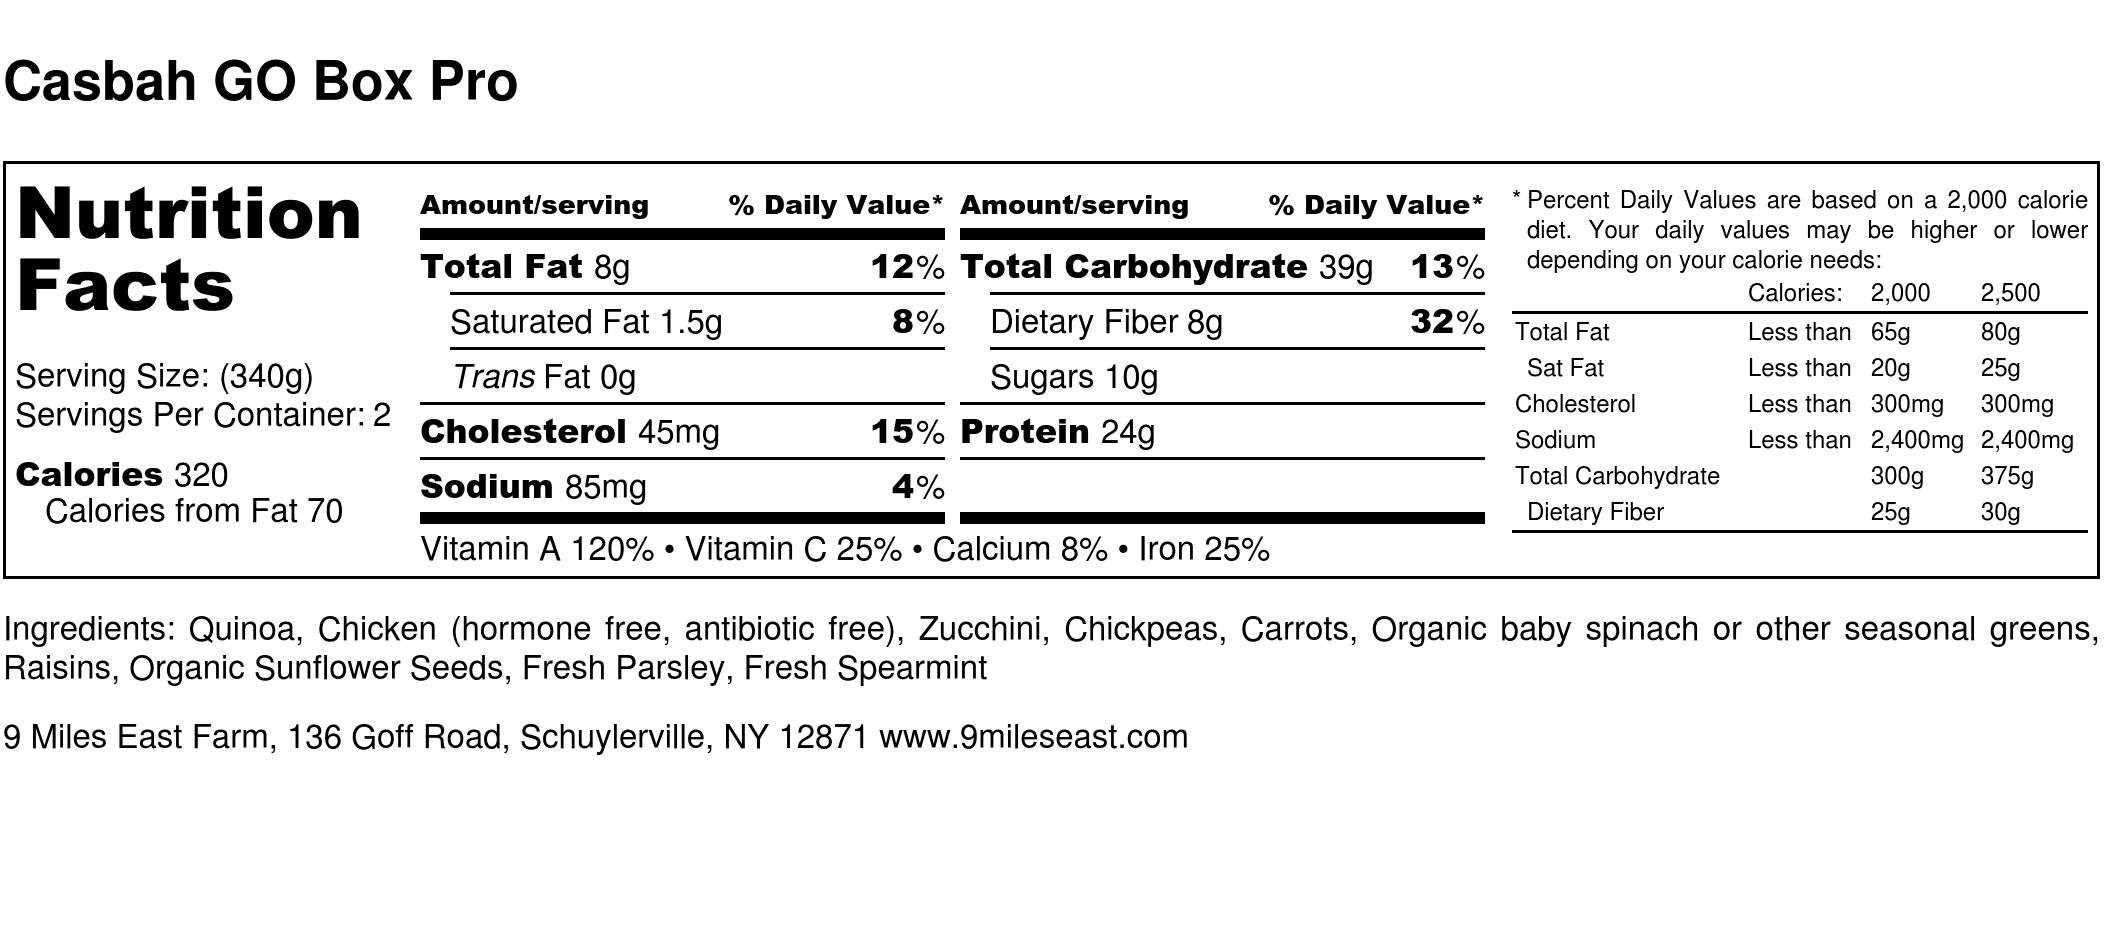 Casbah GO Box Pro - Nutrition Label.jpg